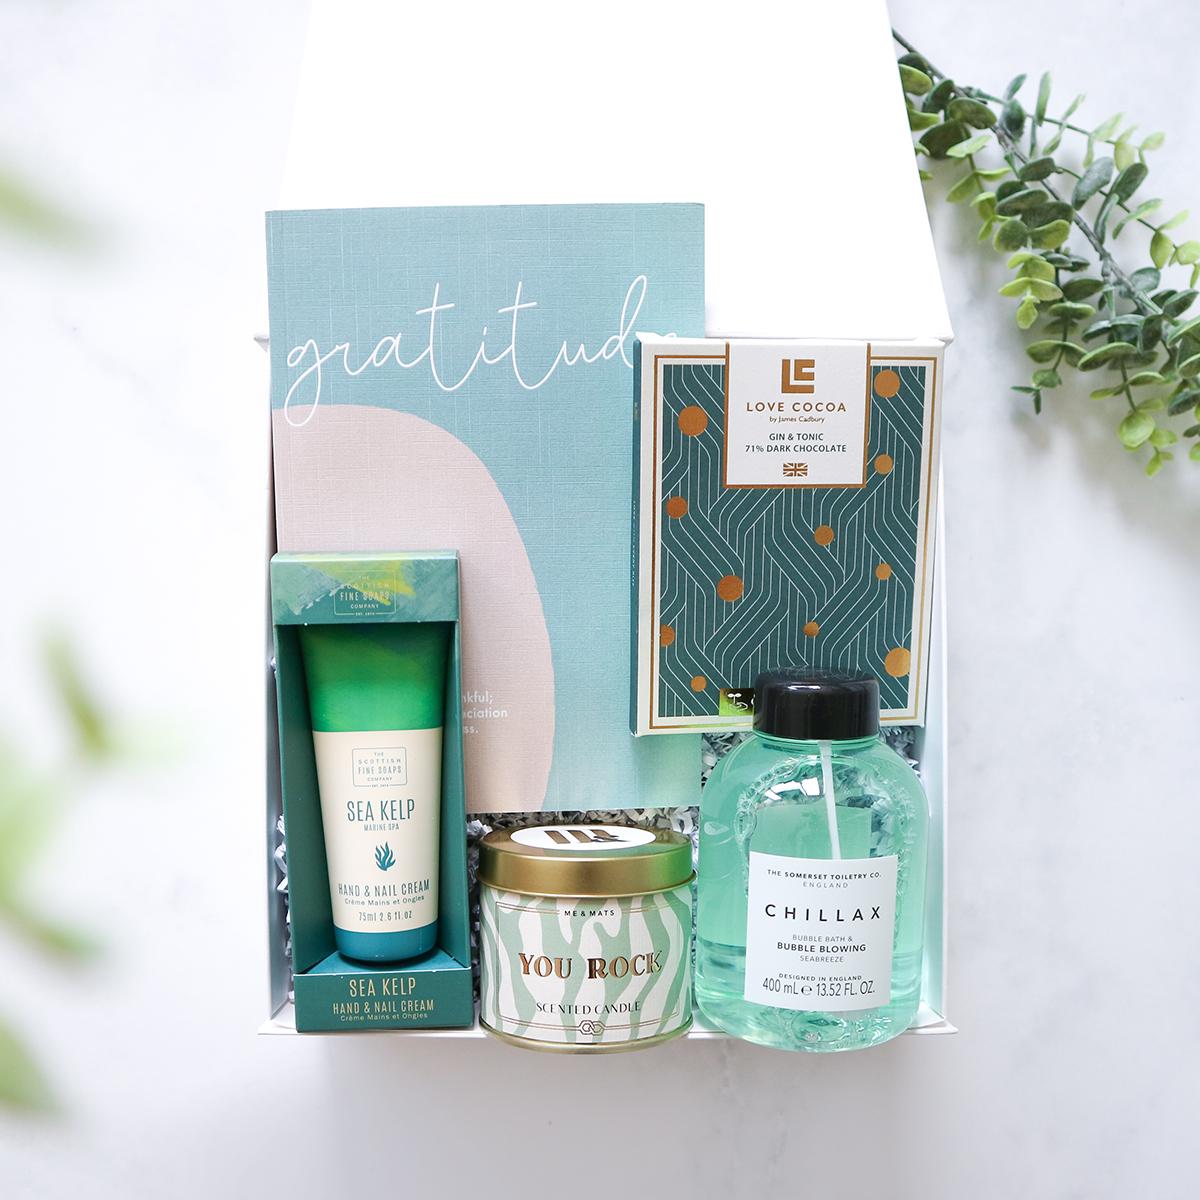 cadeaupakket vrouw, luxe cadeaus, cadeaupakket samenstellen, cadeaubox, cadeauwinkel